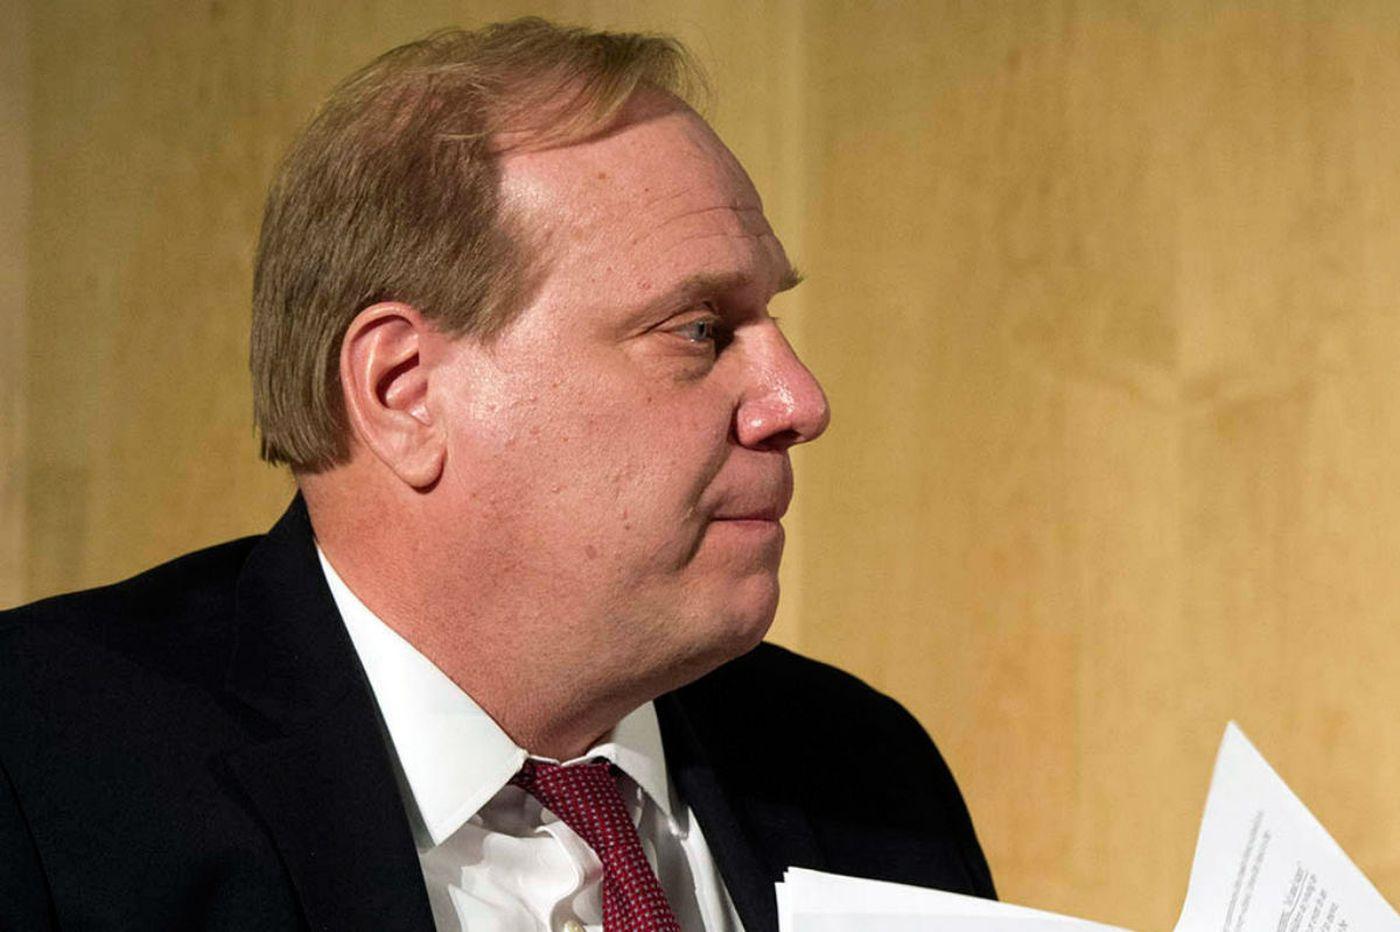 N.J. Education Commissioner Hespe resigns